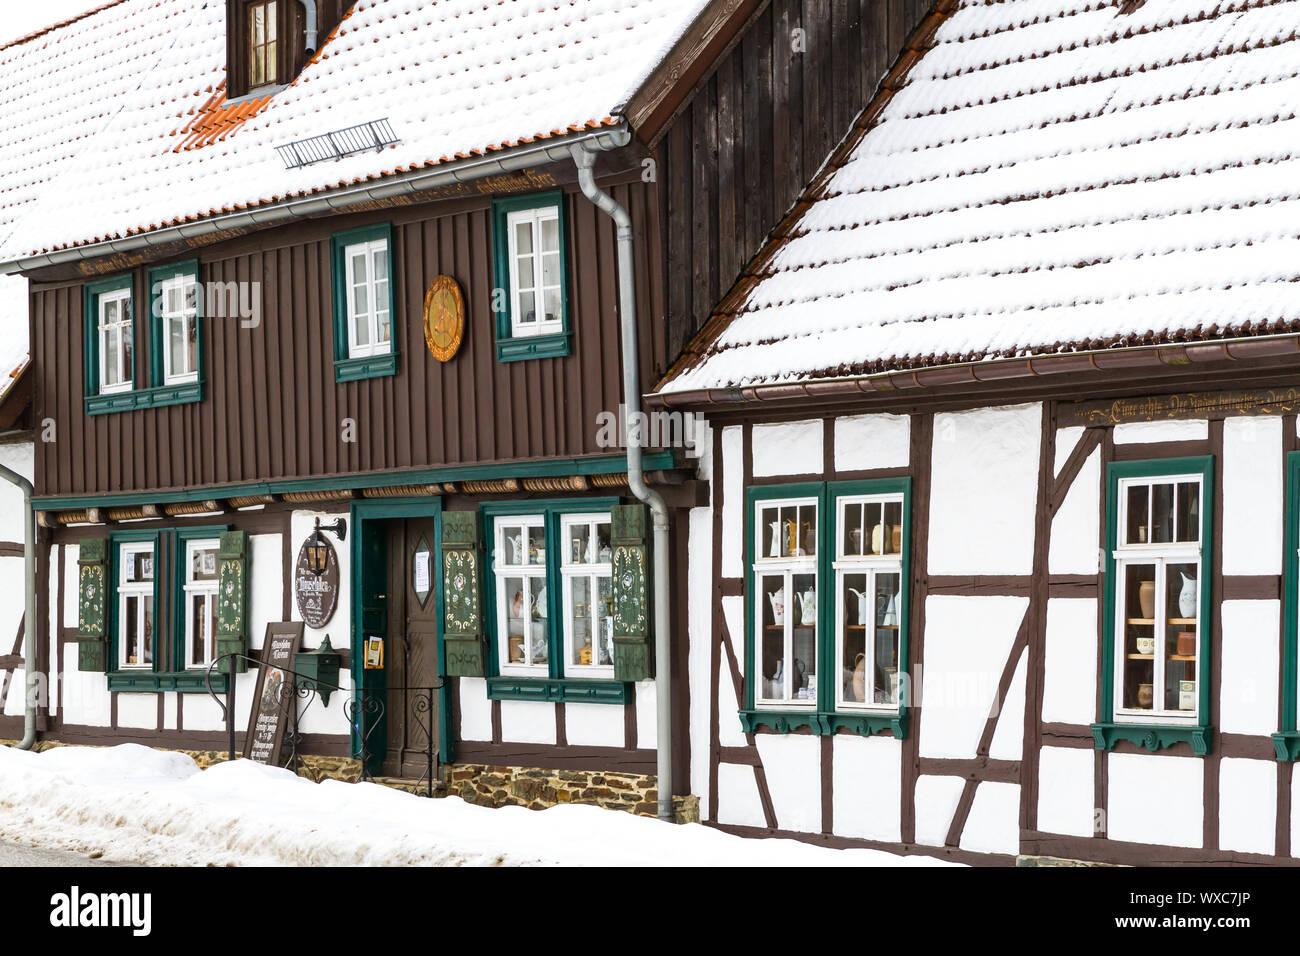 Mausefallen Museum Güntersberge Harz Stock Photo